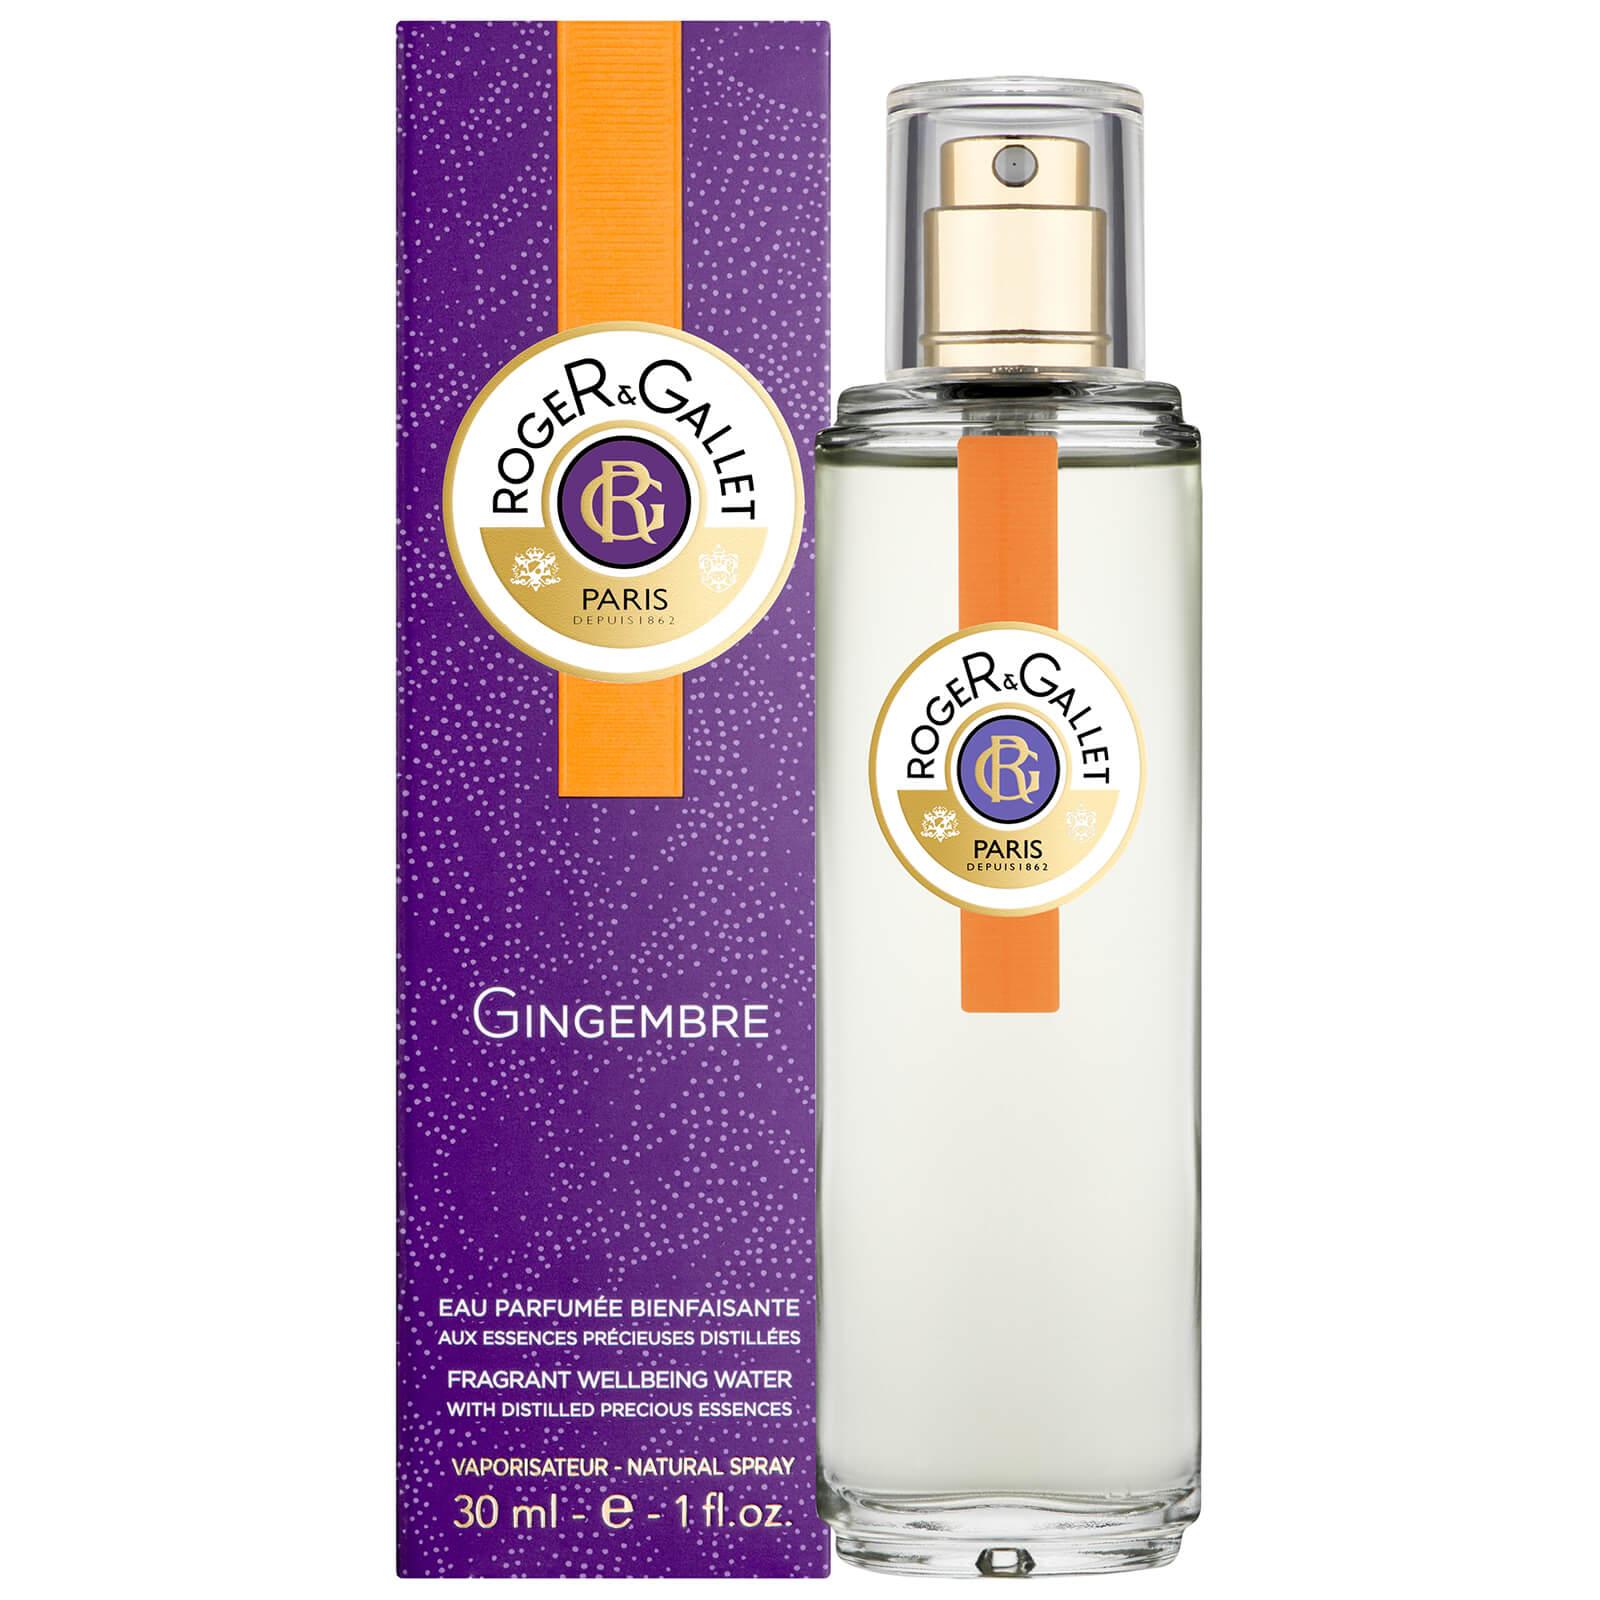 Roger&Gallet Gingembre Eau Fraiche Fragrance 30 ml